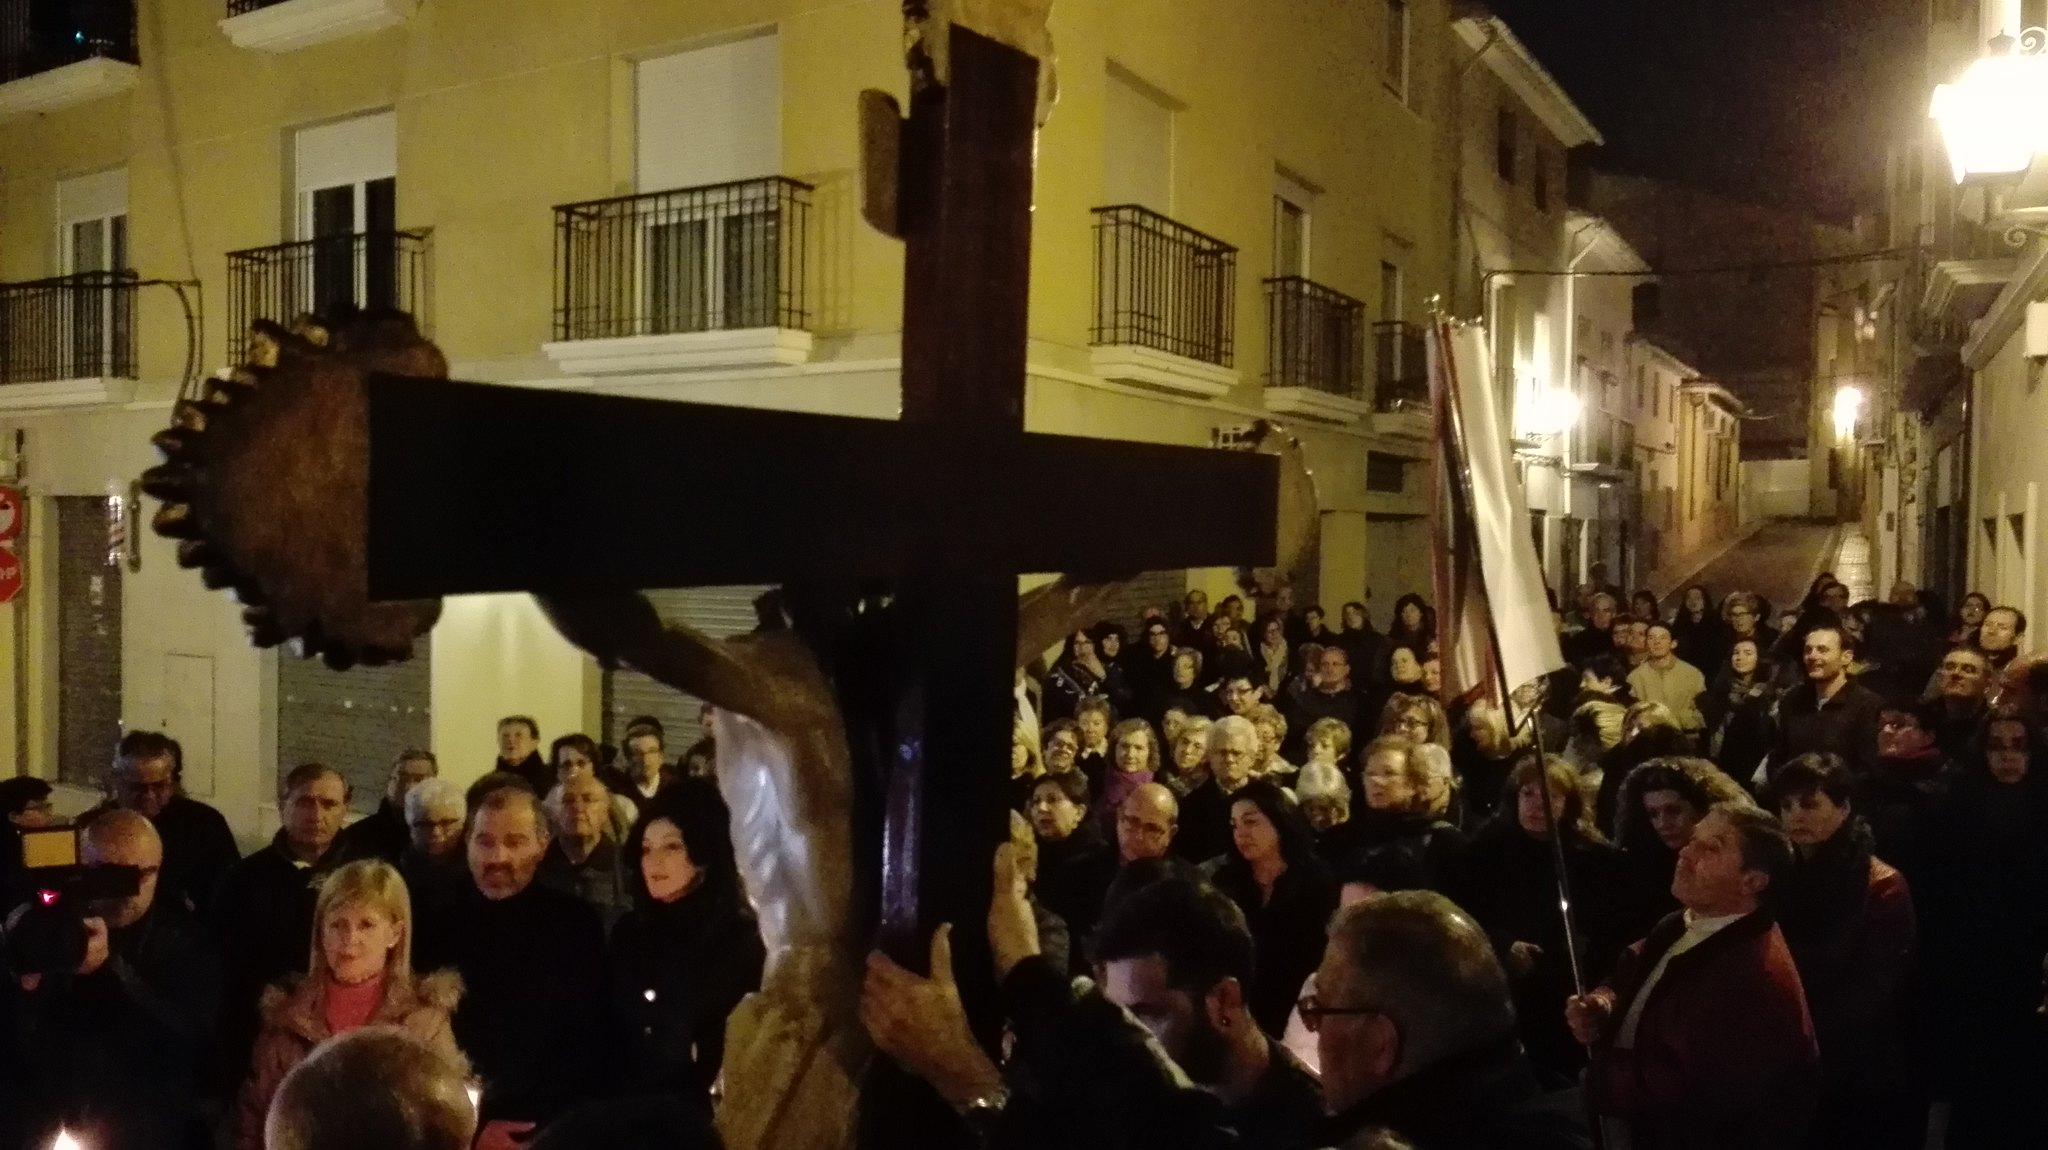 (2016-03-18) - VII Vía Crucis nocturno - Javier Romero Ripoll (112)